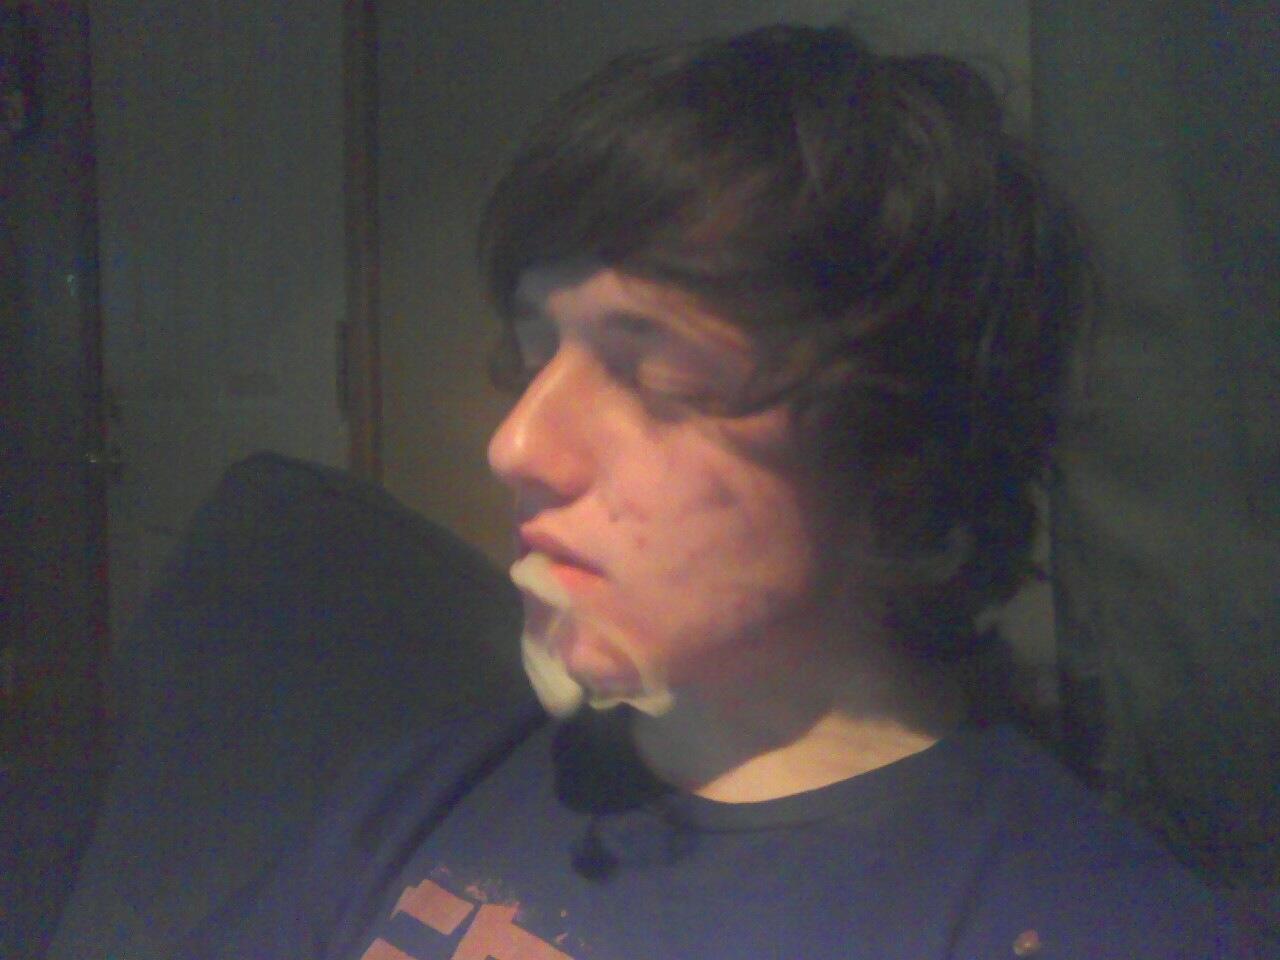 scum beard